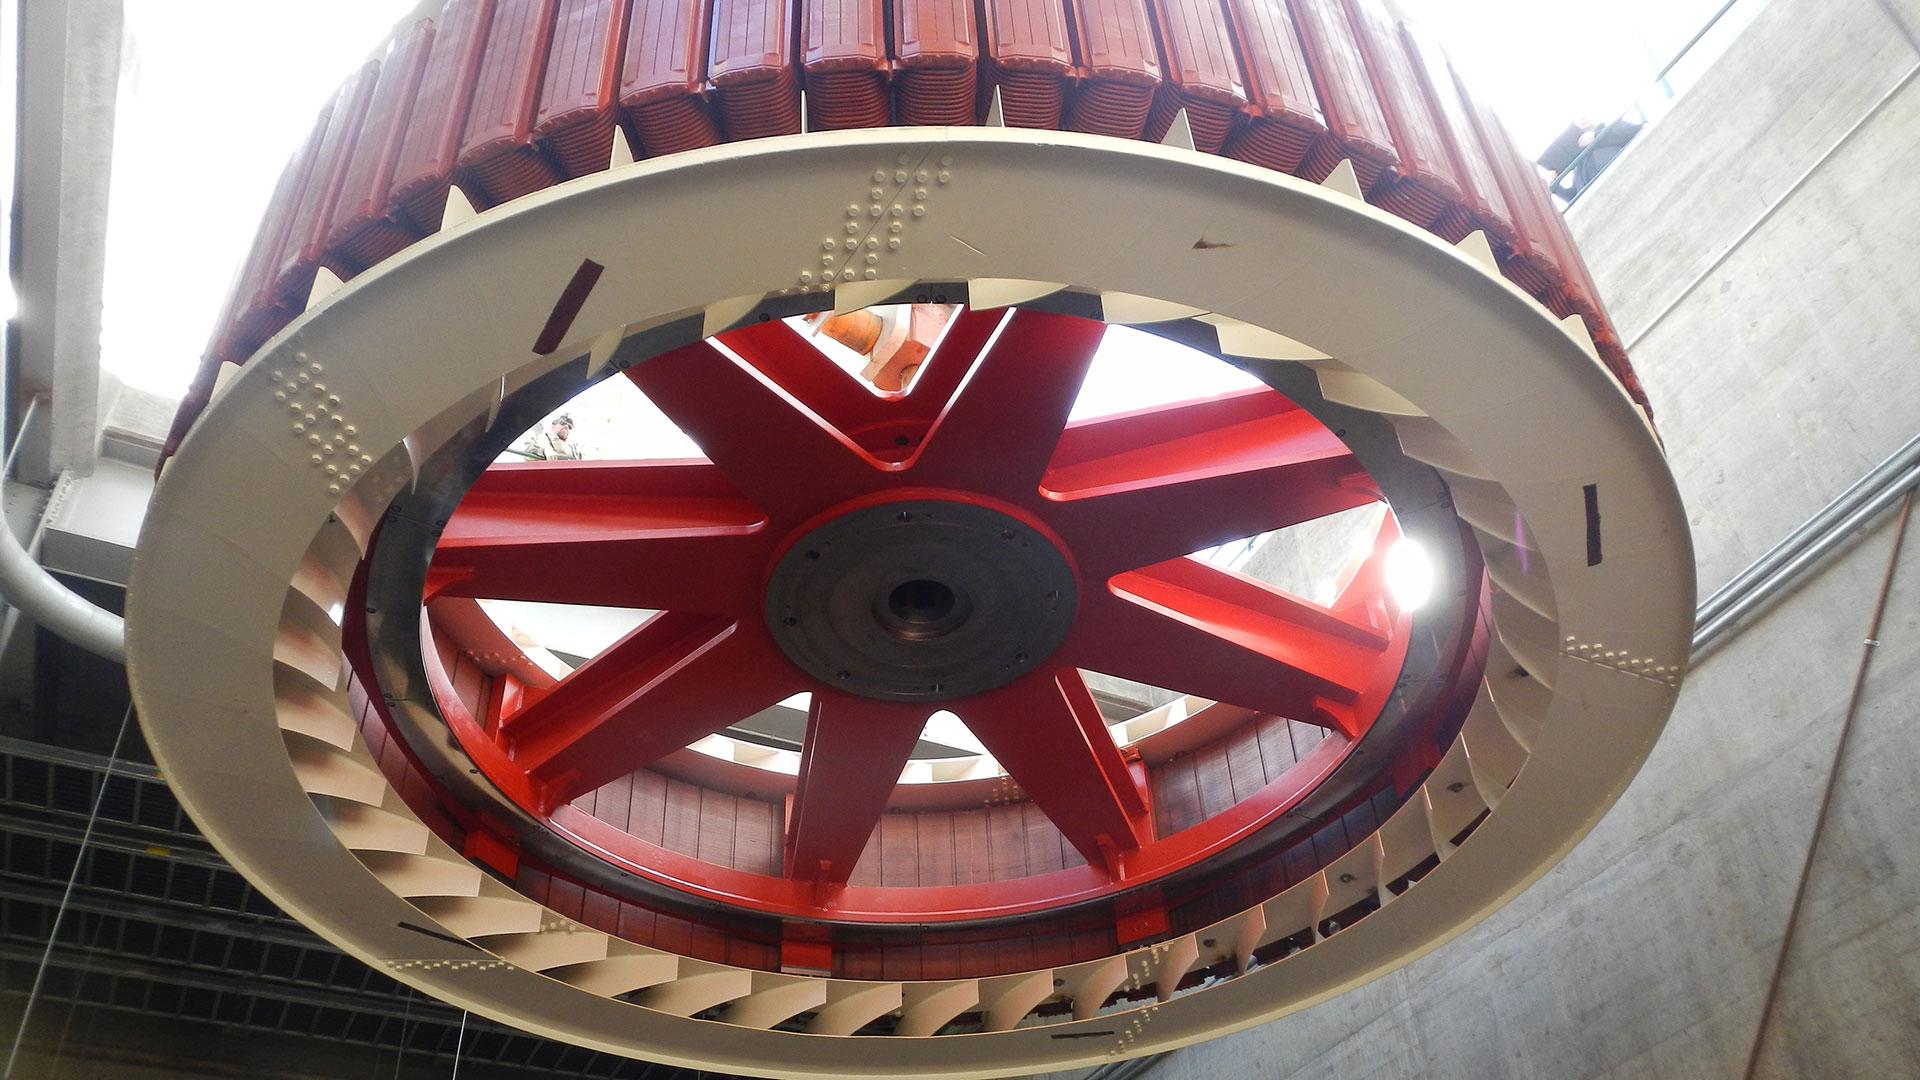 Box Canyon Turbine Upgrades